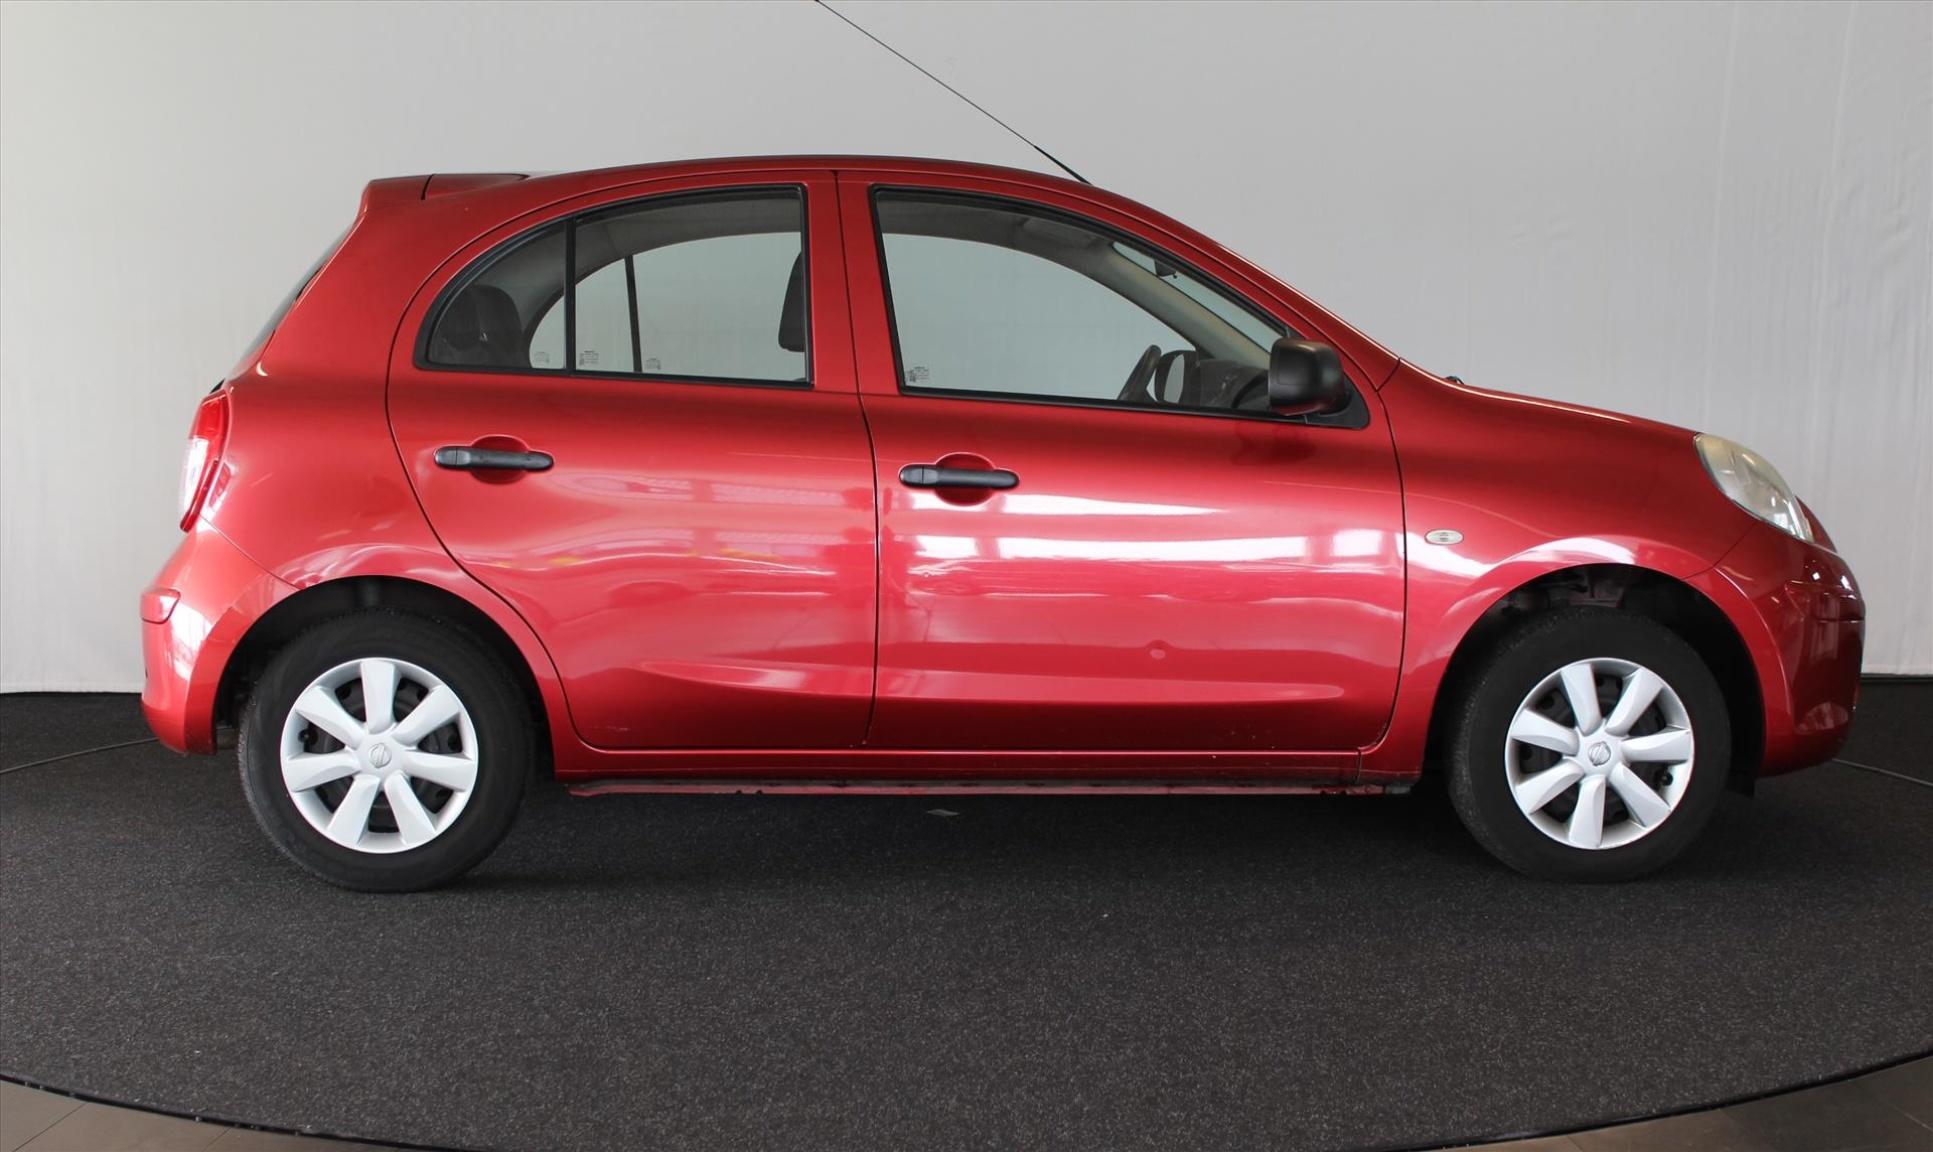 Nissan-Micra-3